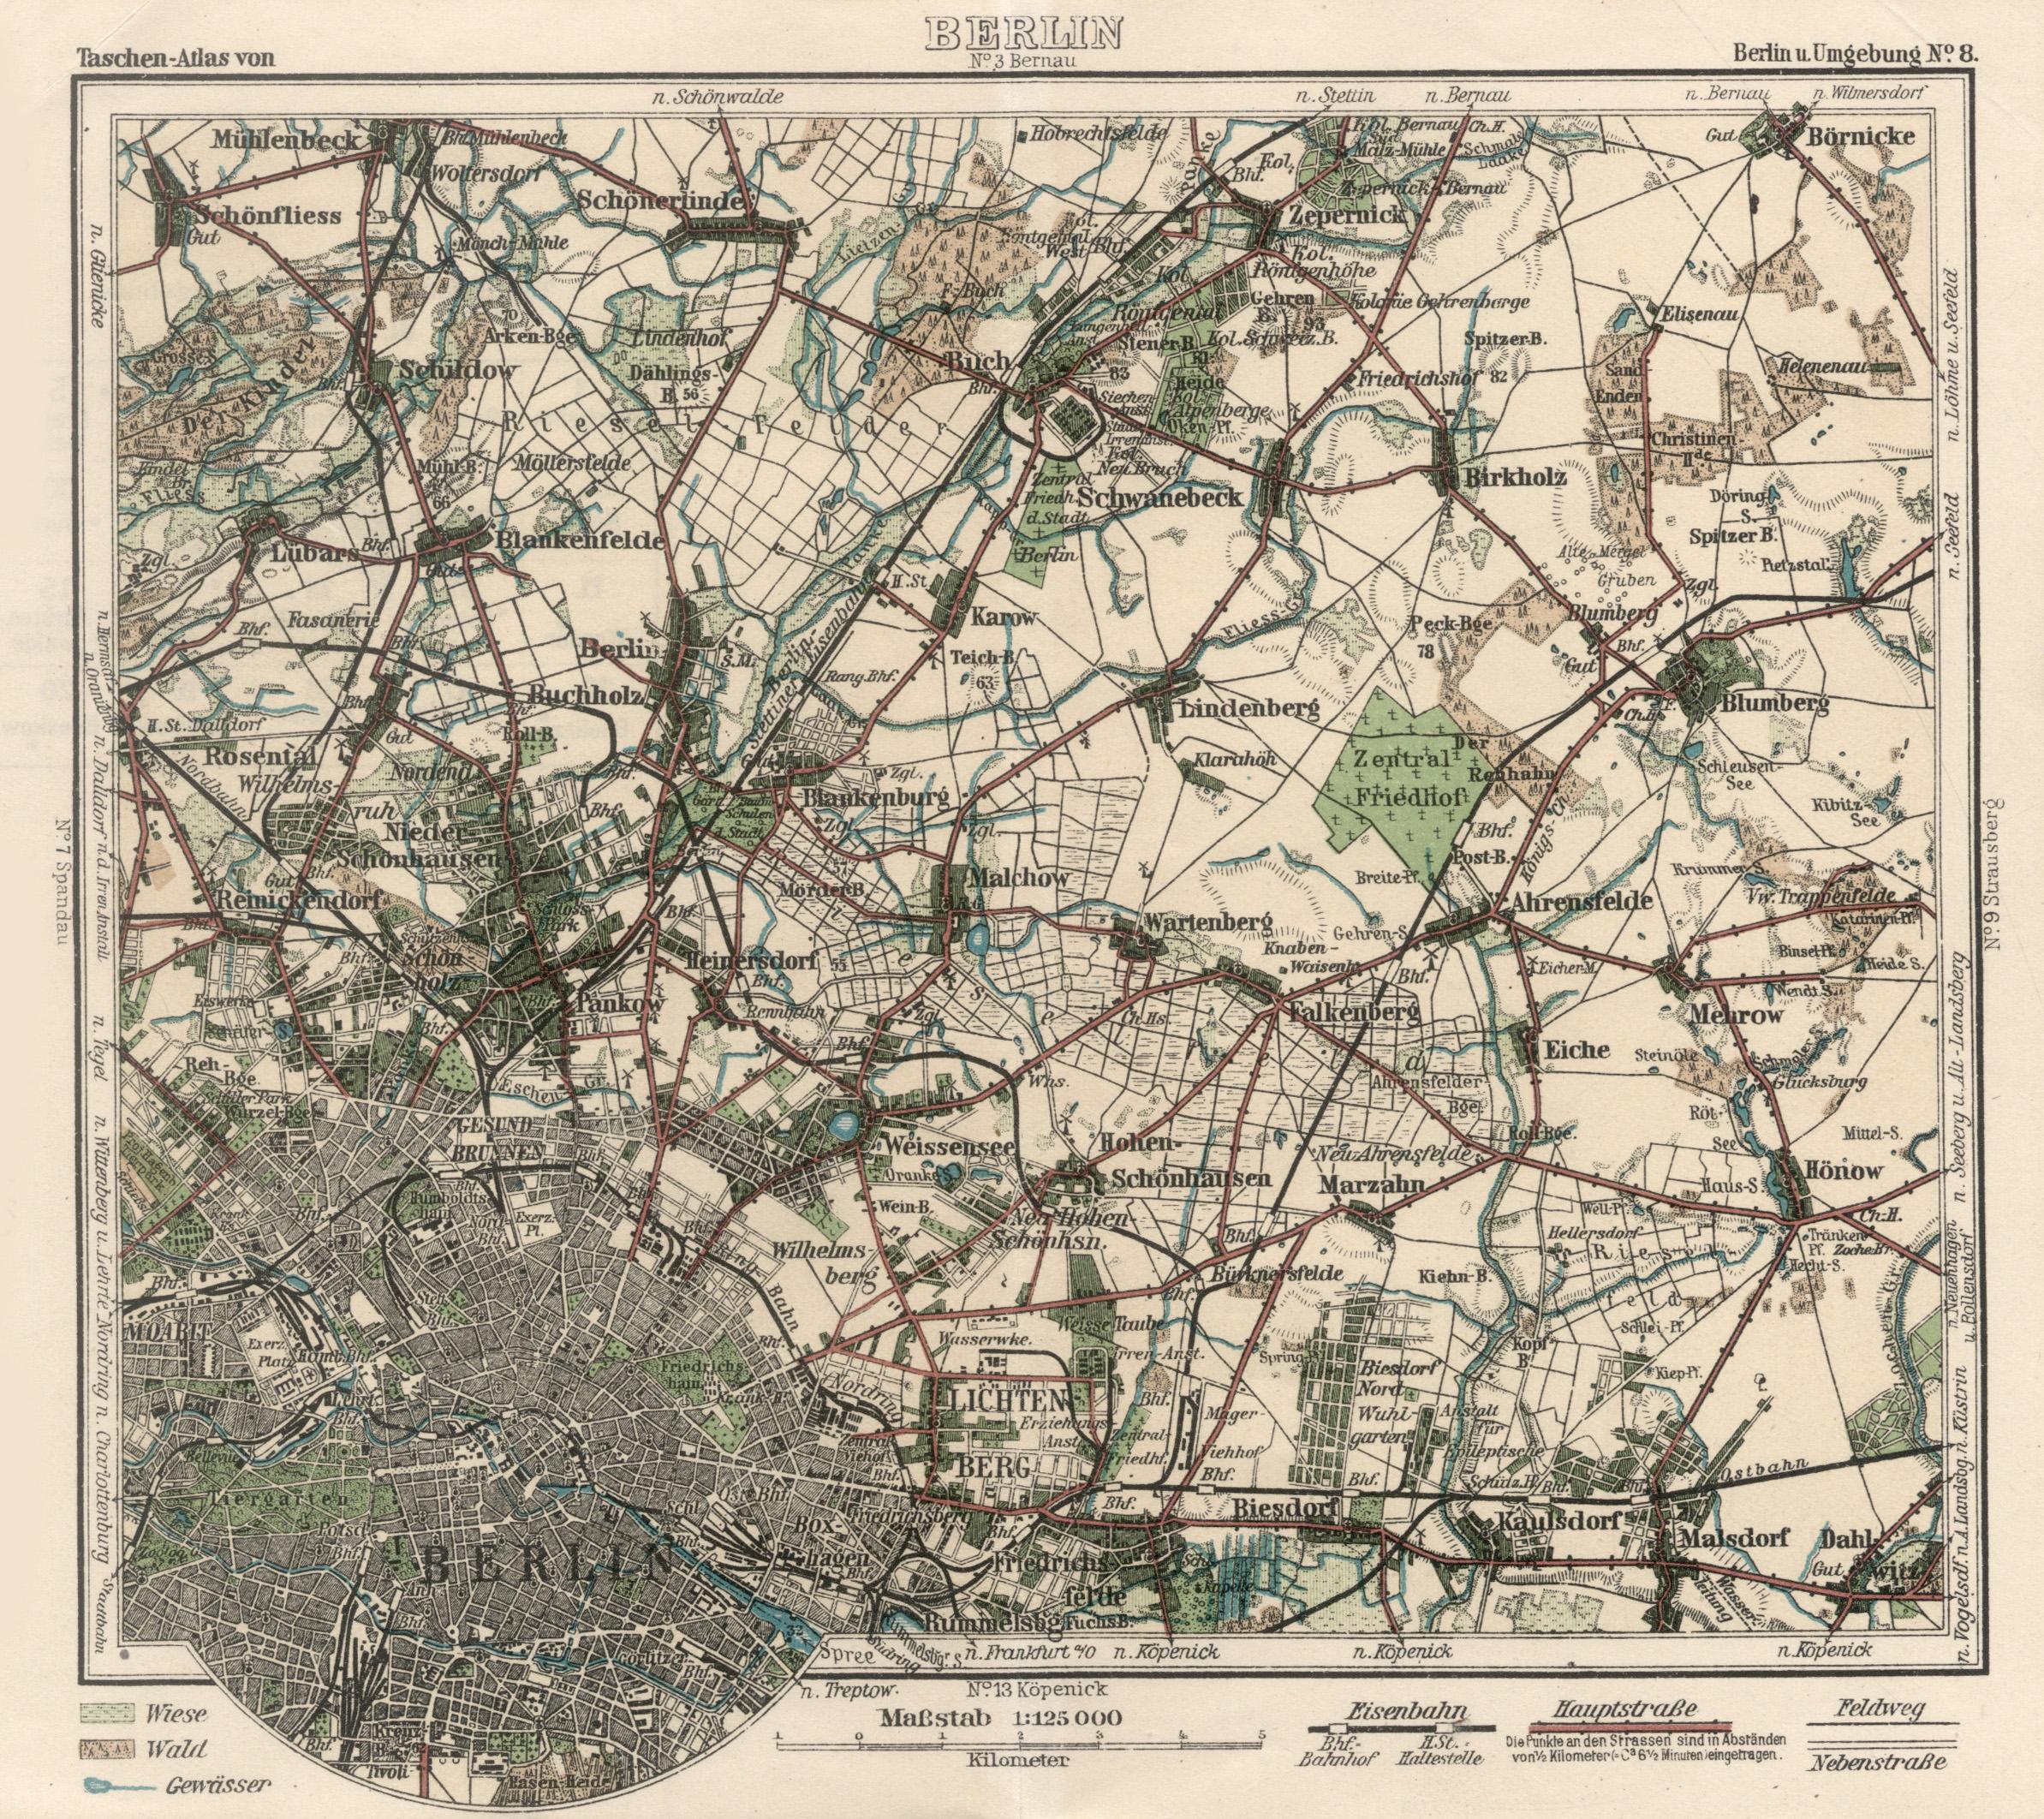 Farblitho. - Karte aus Peip s Taschenatlas,.: Berlin - Umgebungskarte: